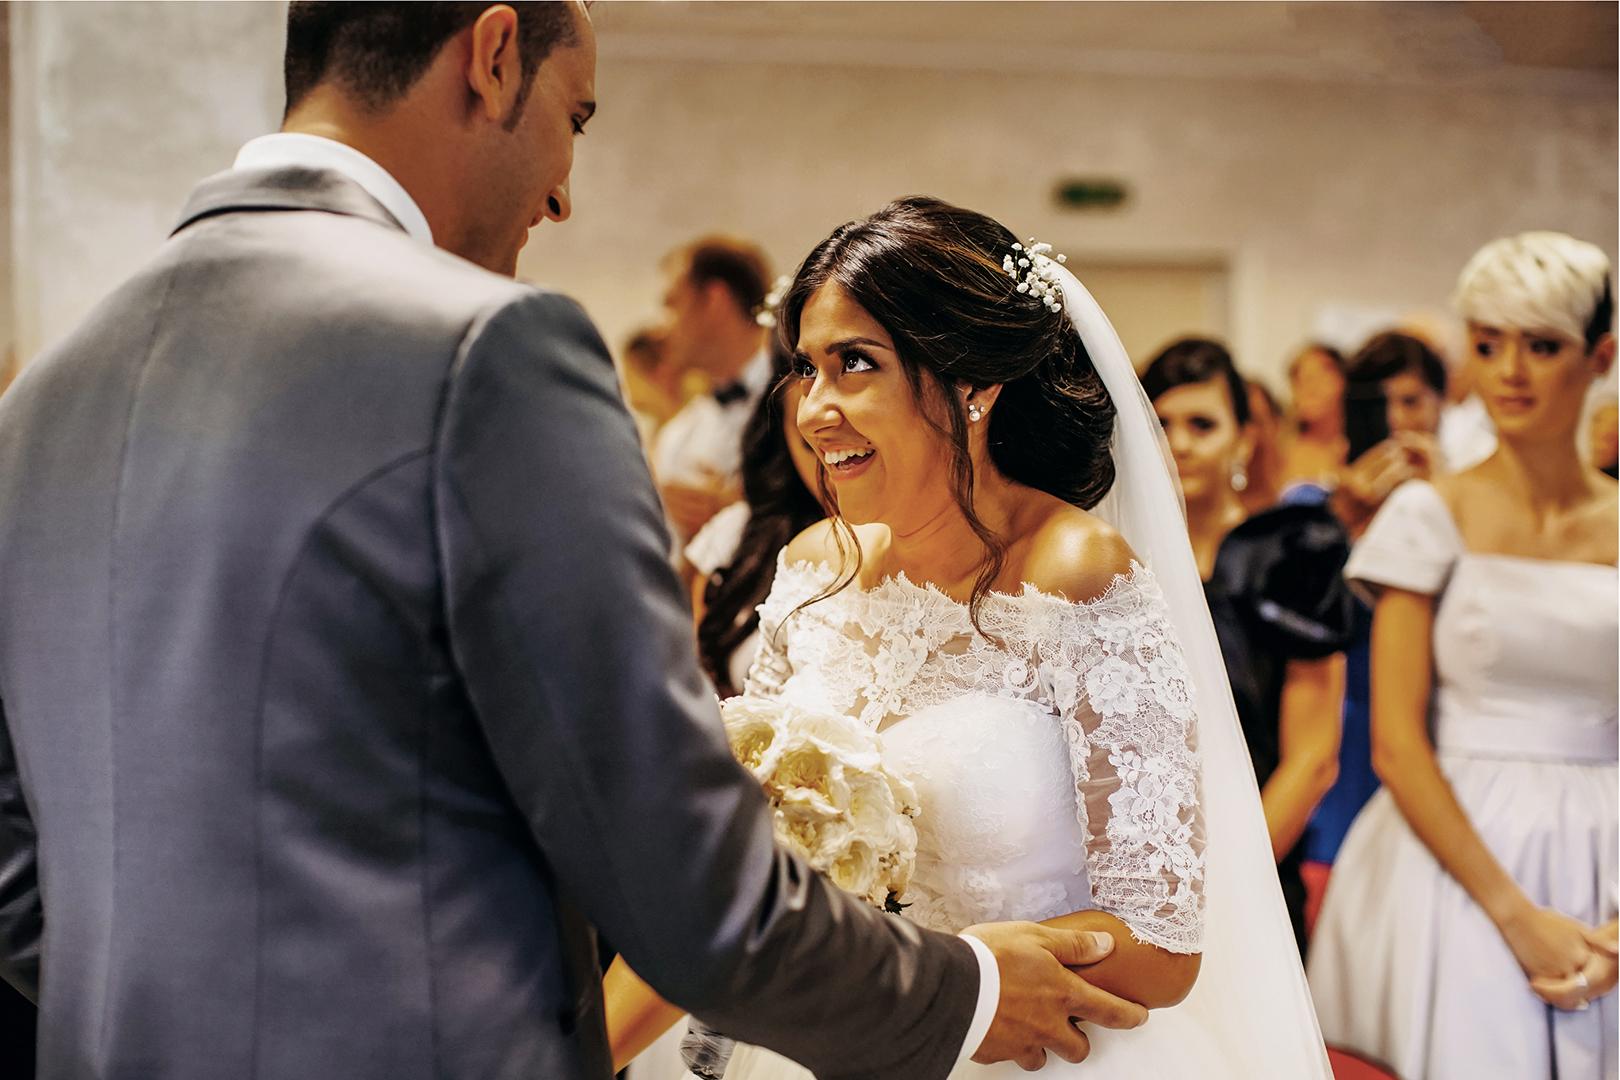 27 gianni-lepore-sposa-bride-sala-regno-lucera-incontro-sposo-groom